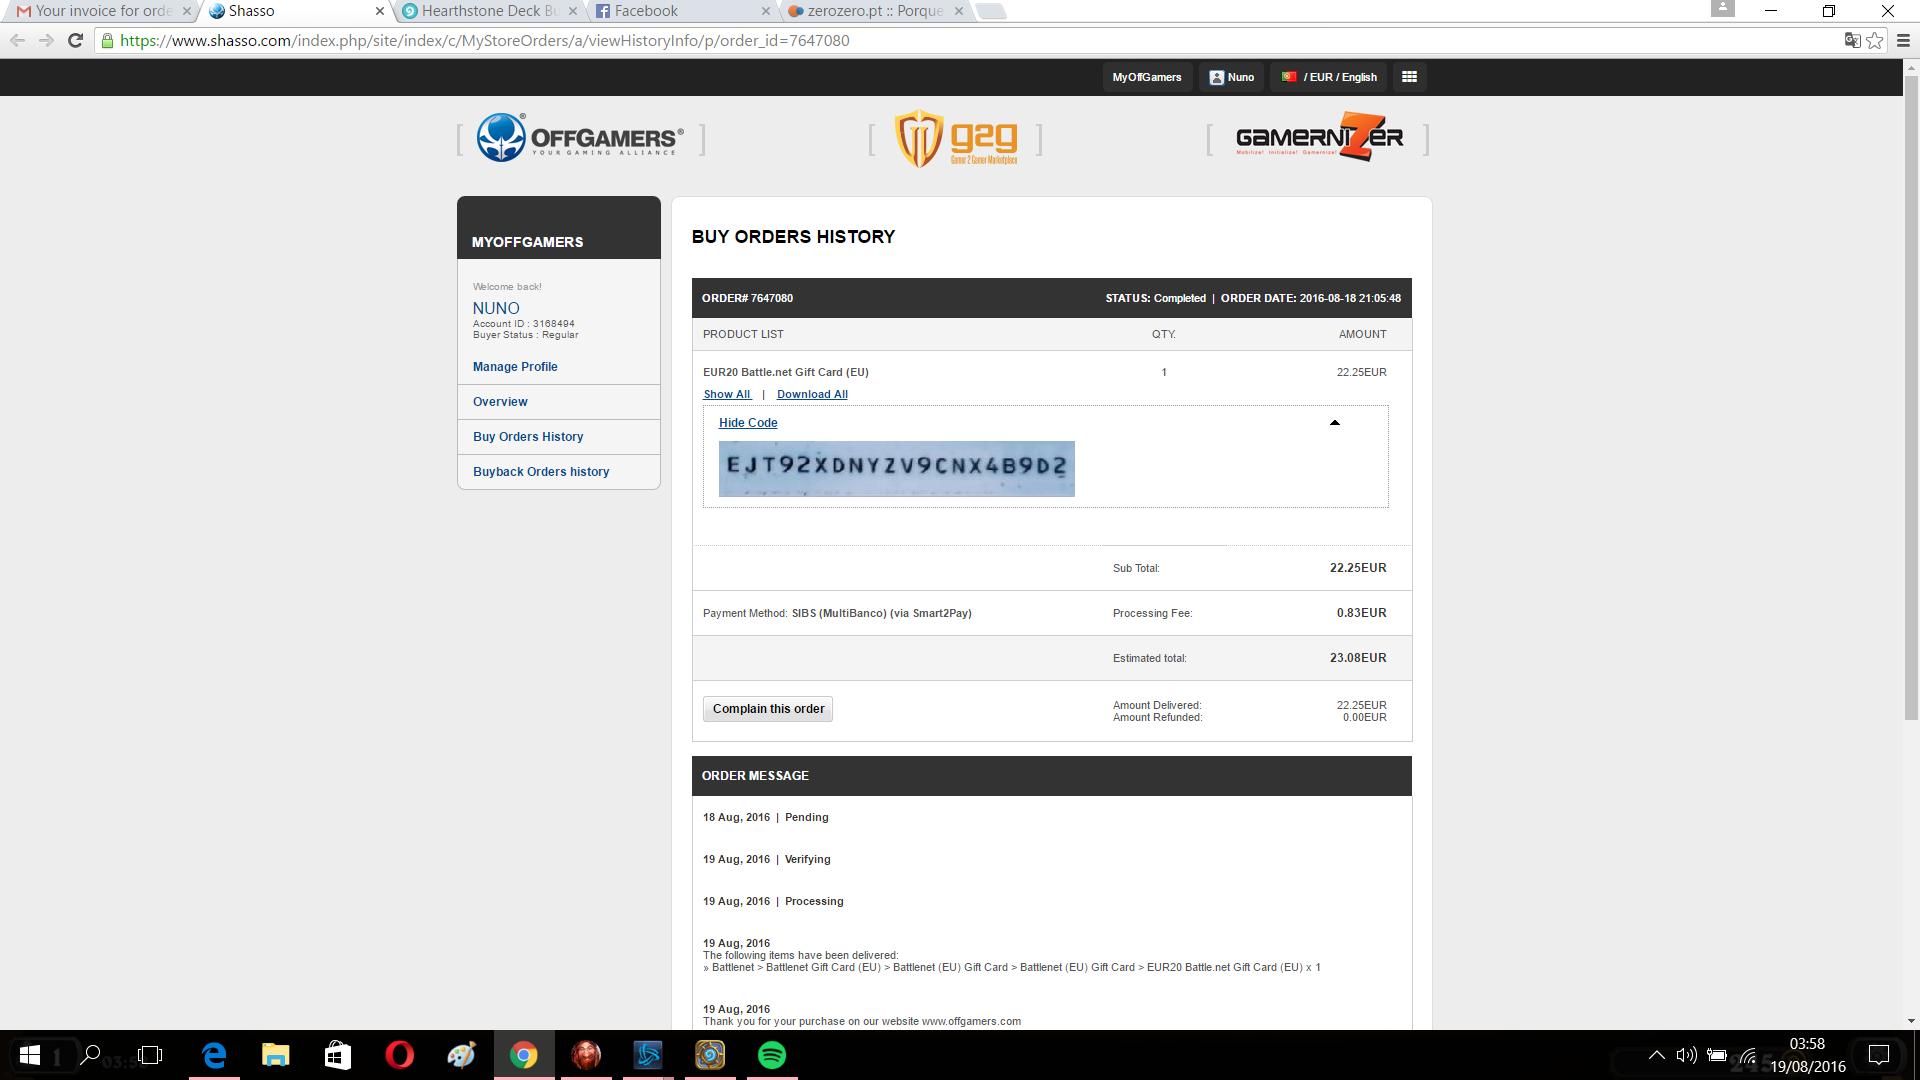 Battle.net code scam : OffGamers Support Center